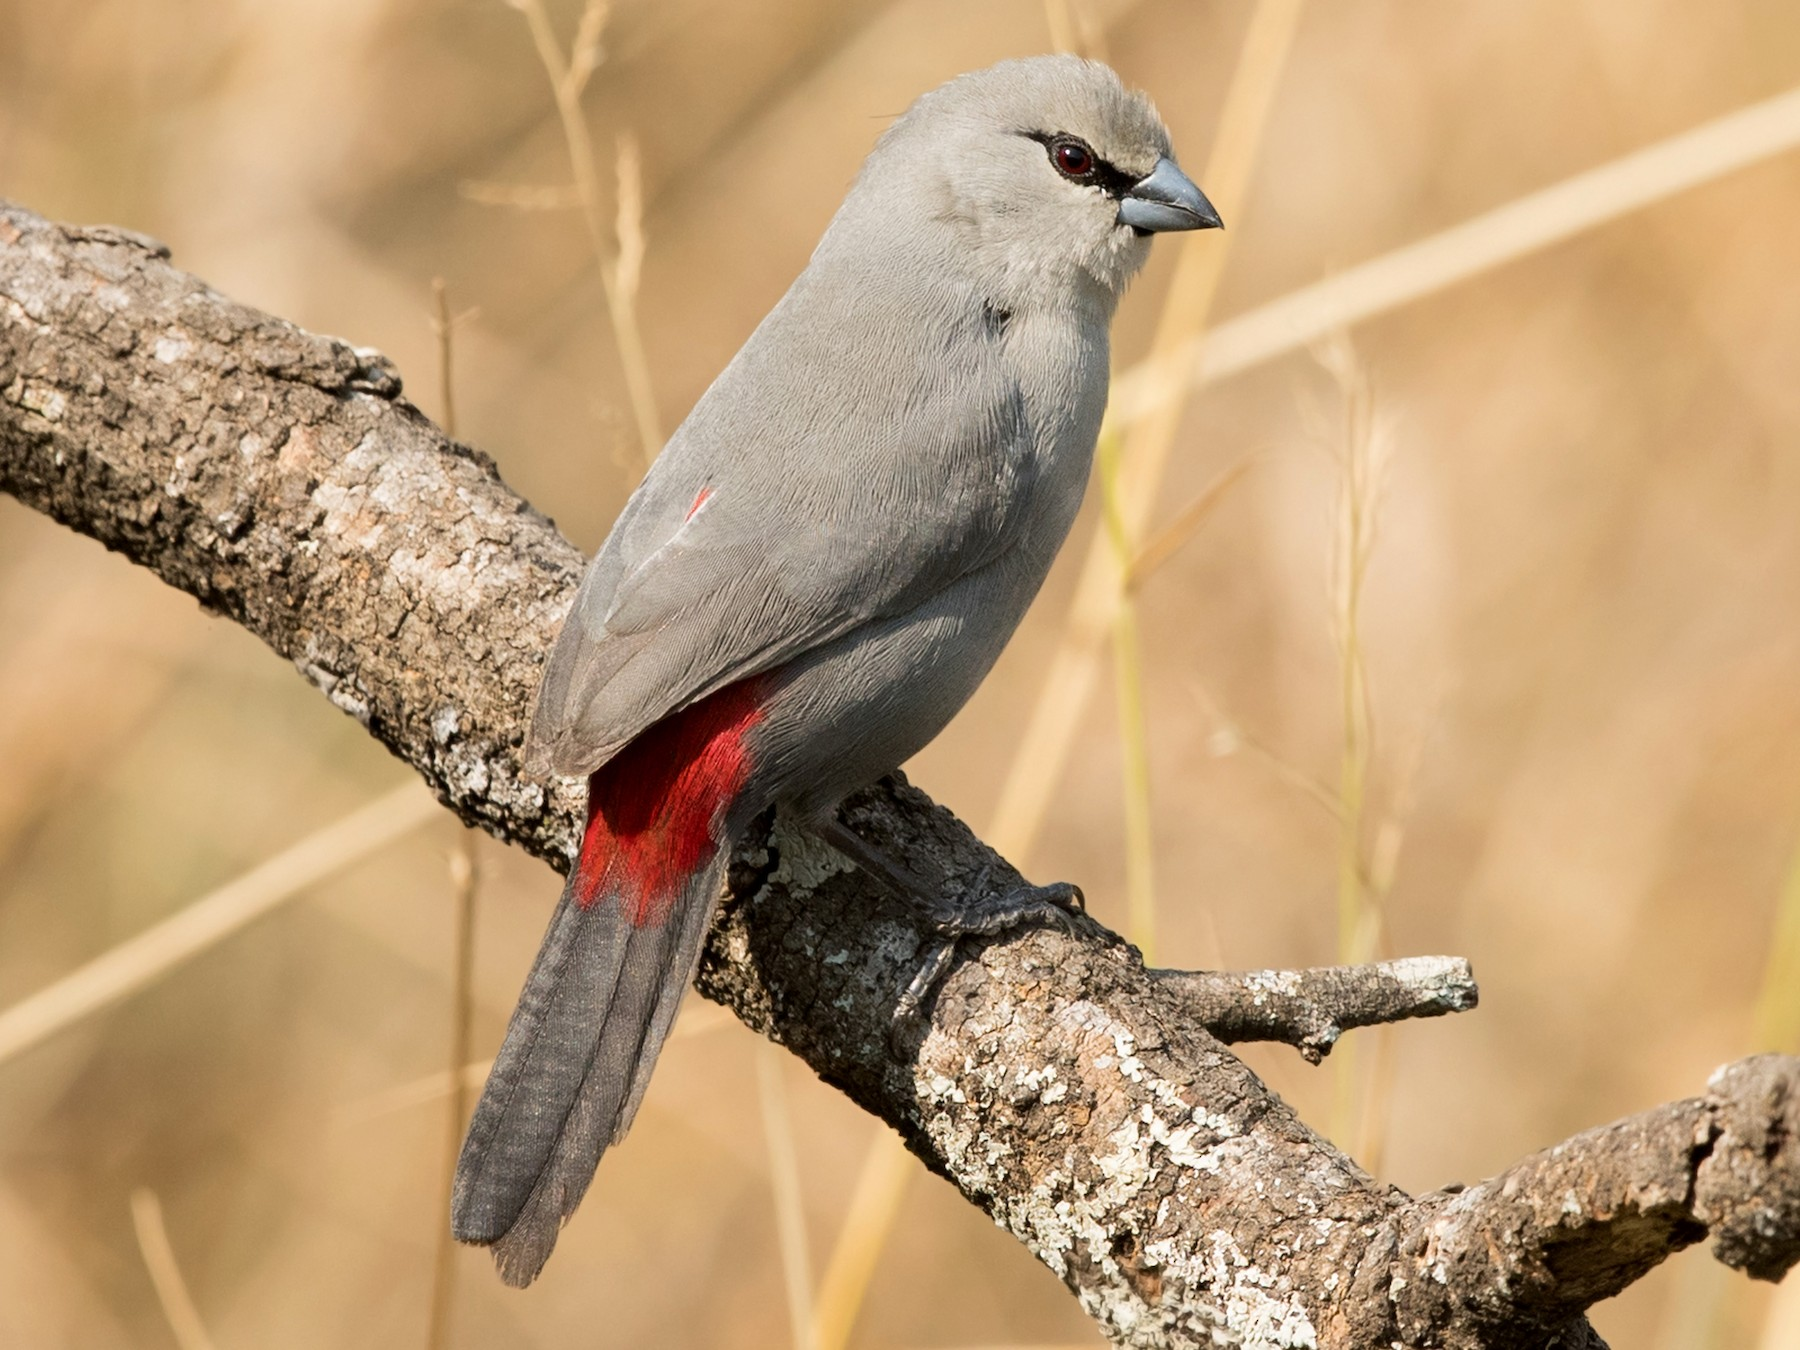 Black-tailed Waxbill - David Irving